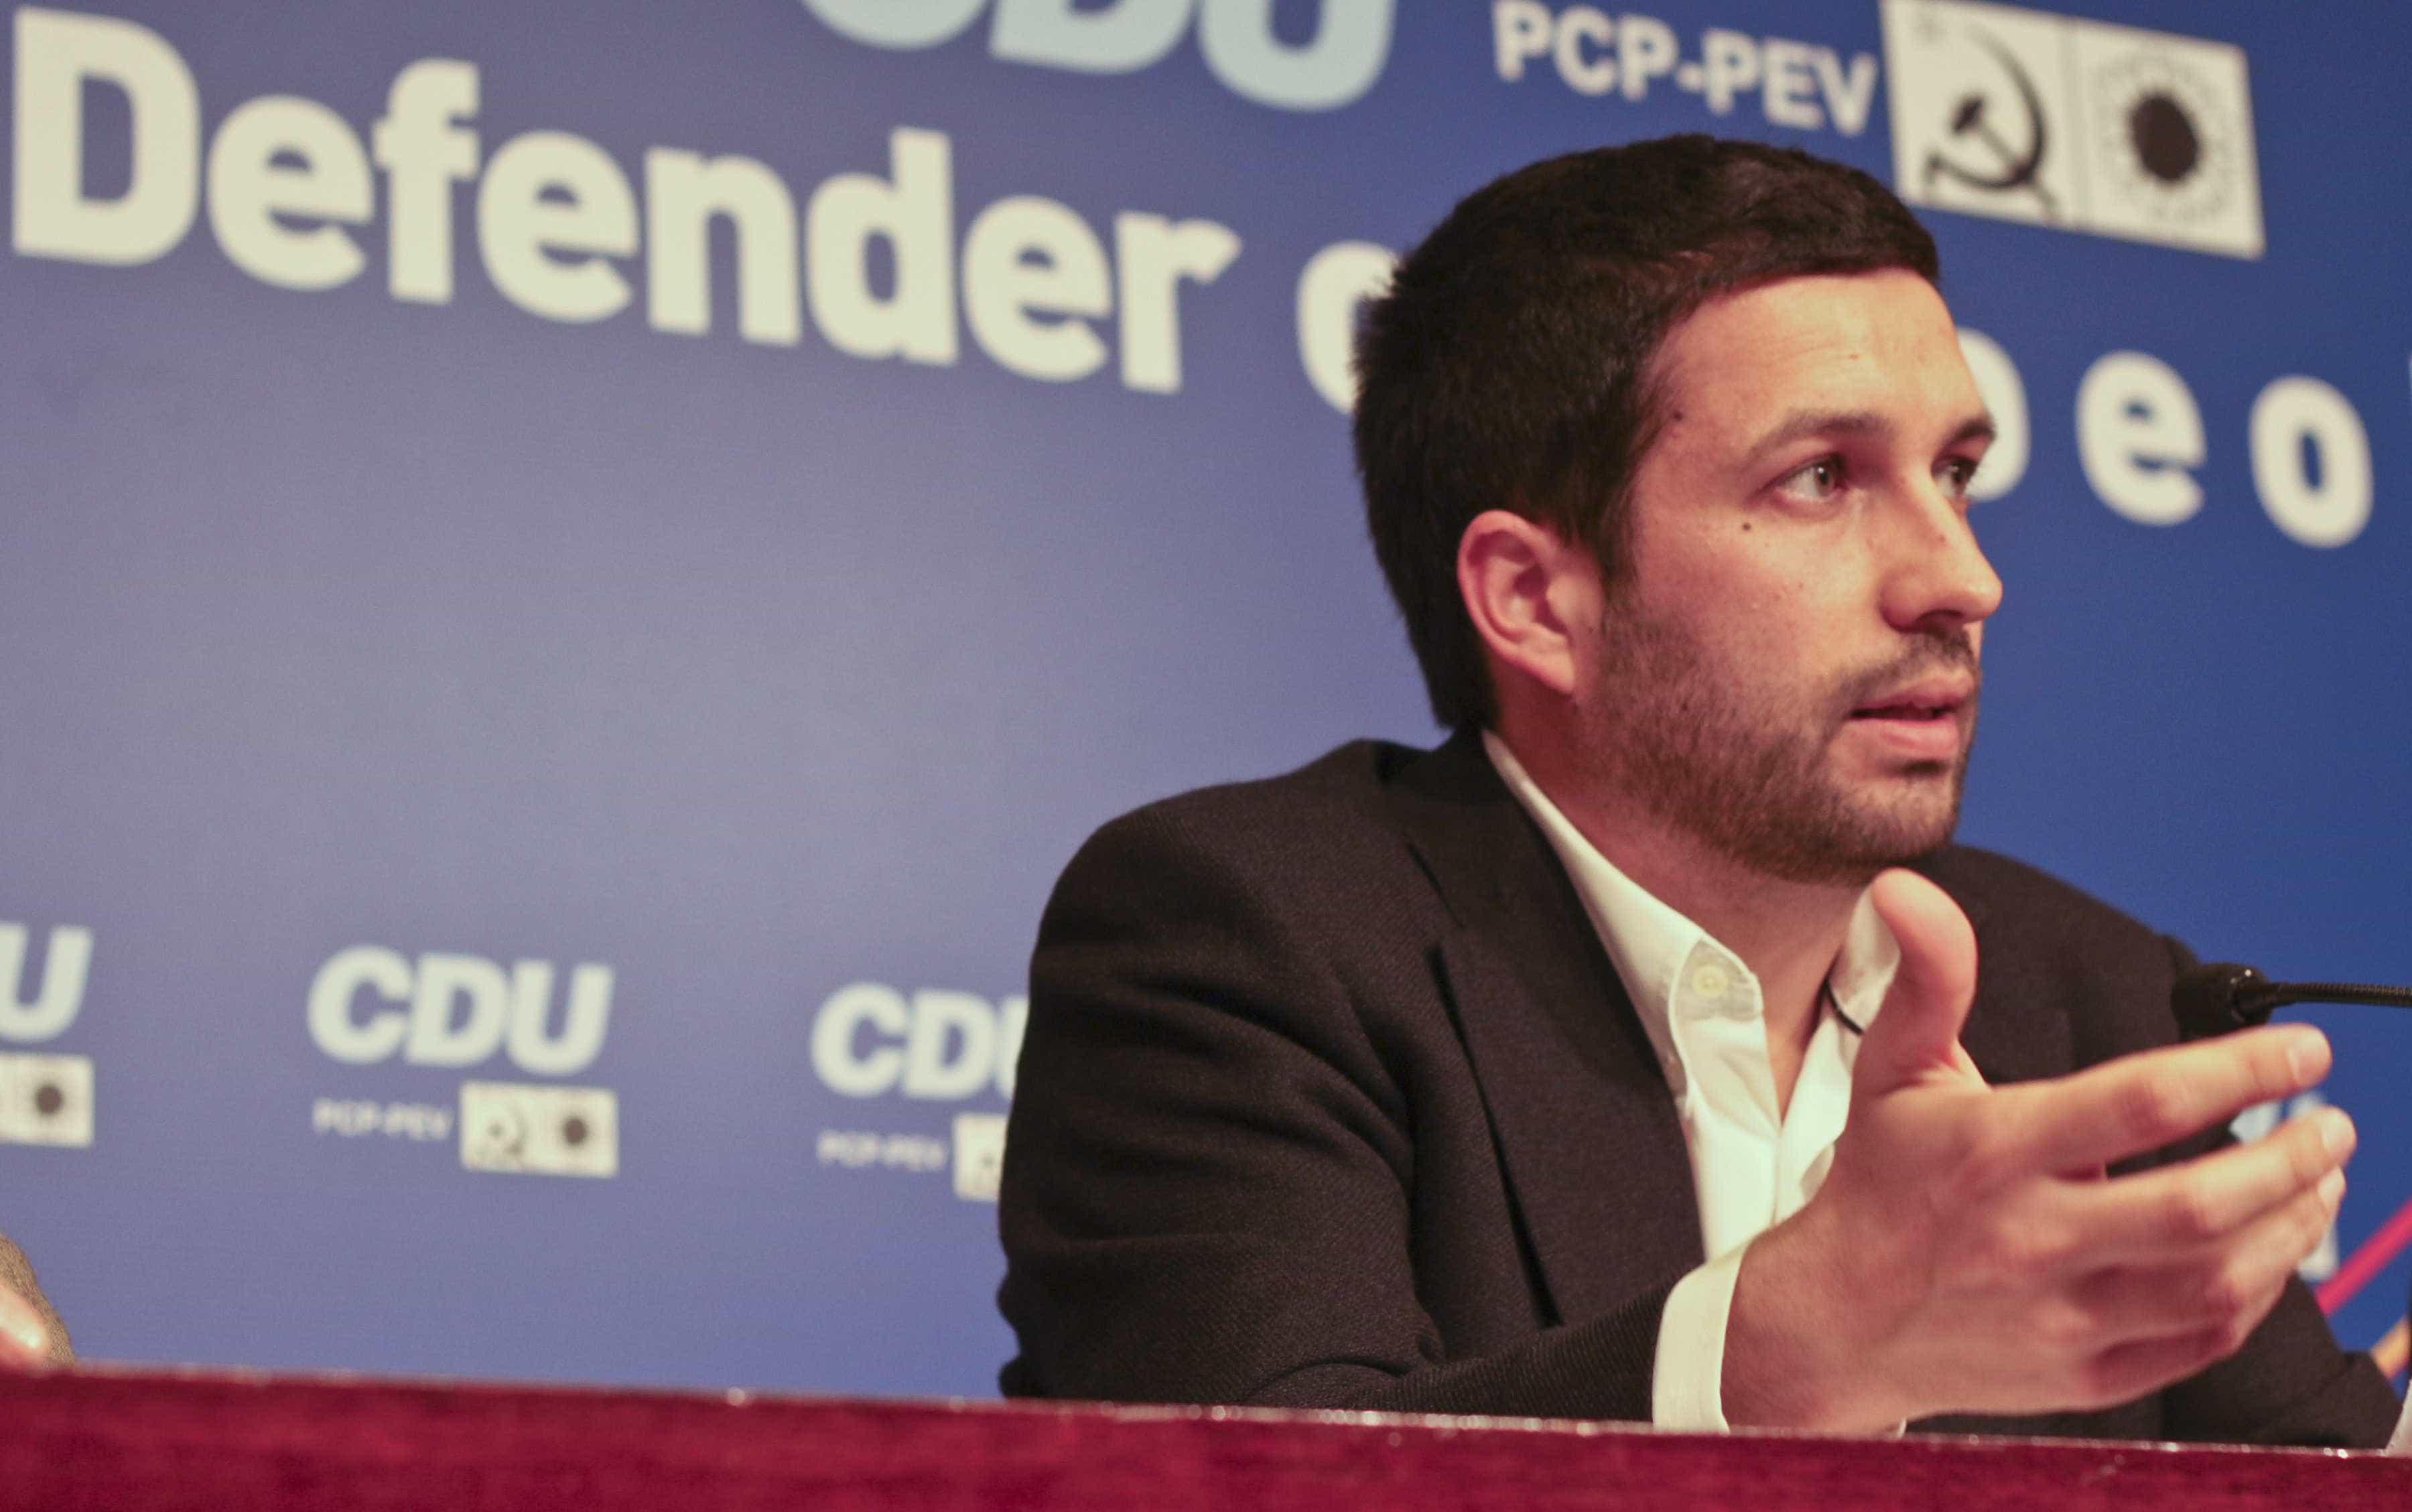 "Venezuela: PCP acusa Estrasburgo de ""inaceitável exercício de ingerência"""